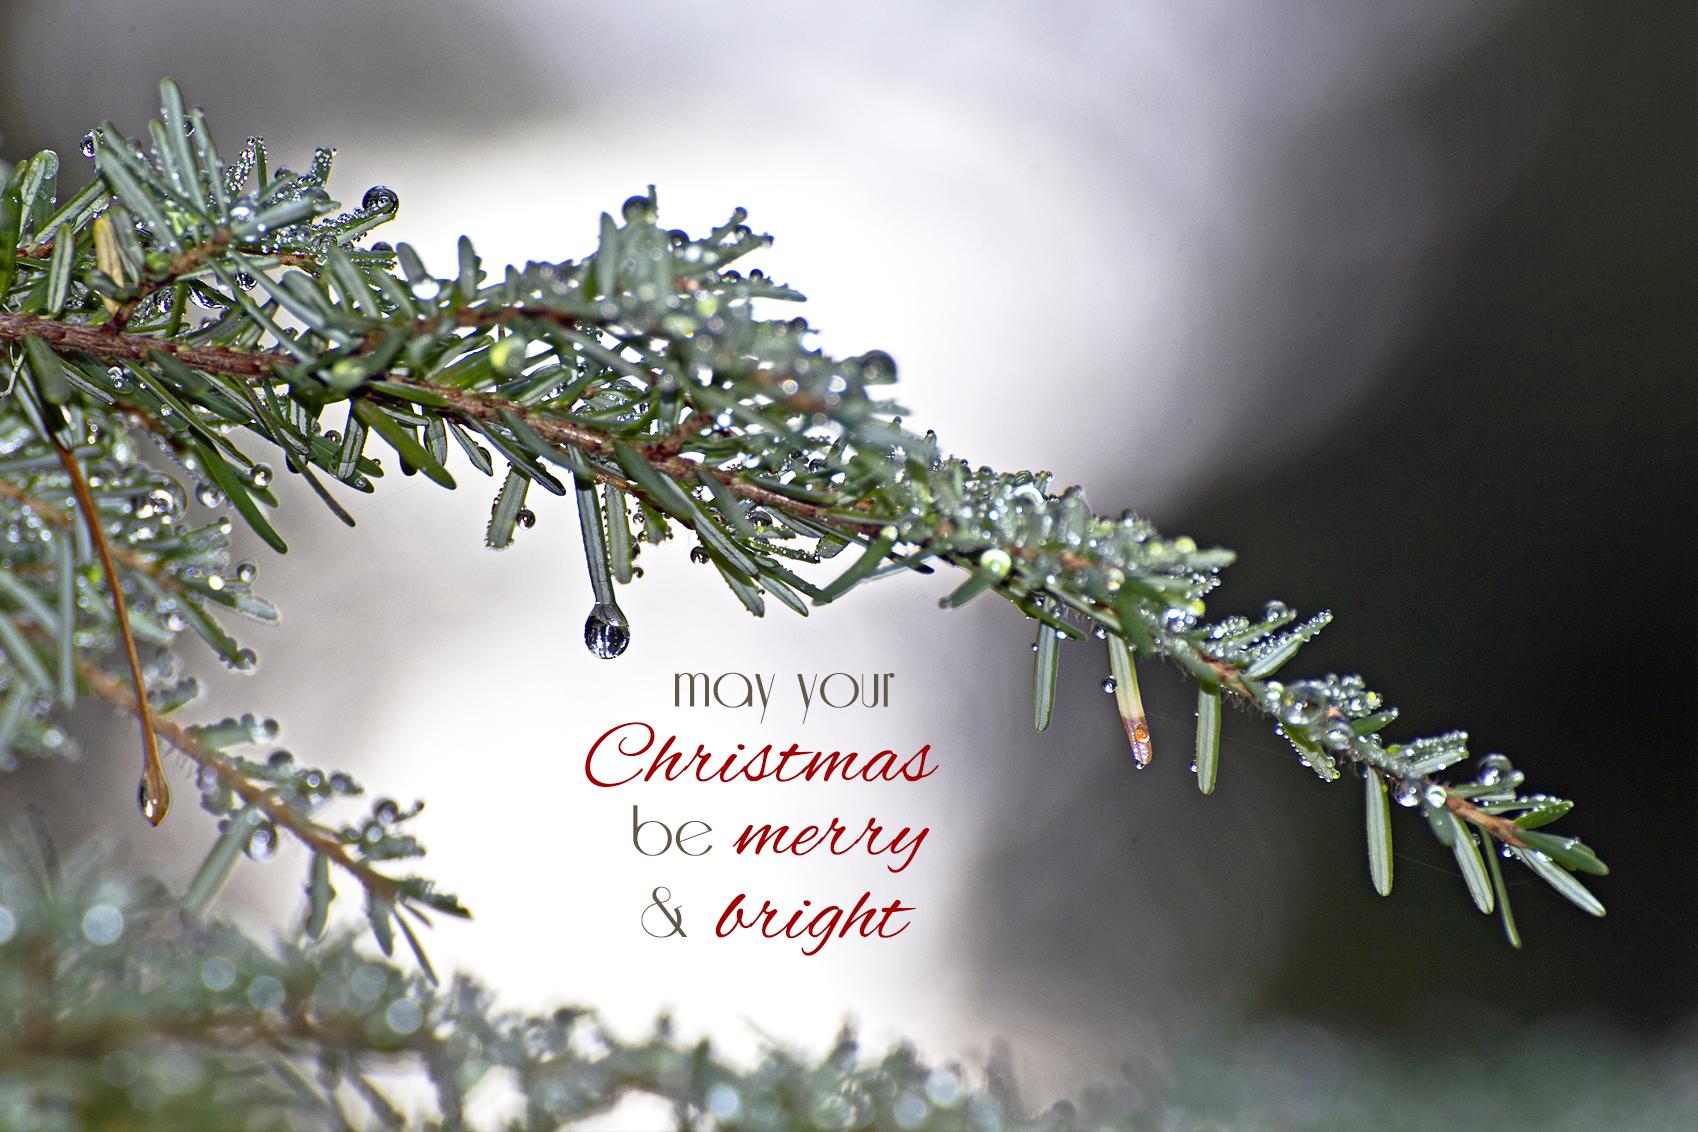 Merry bright desktop background 101 Days of Christmas Life 1698x1132